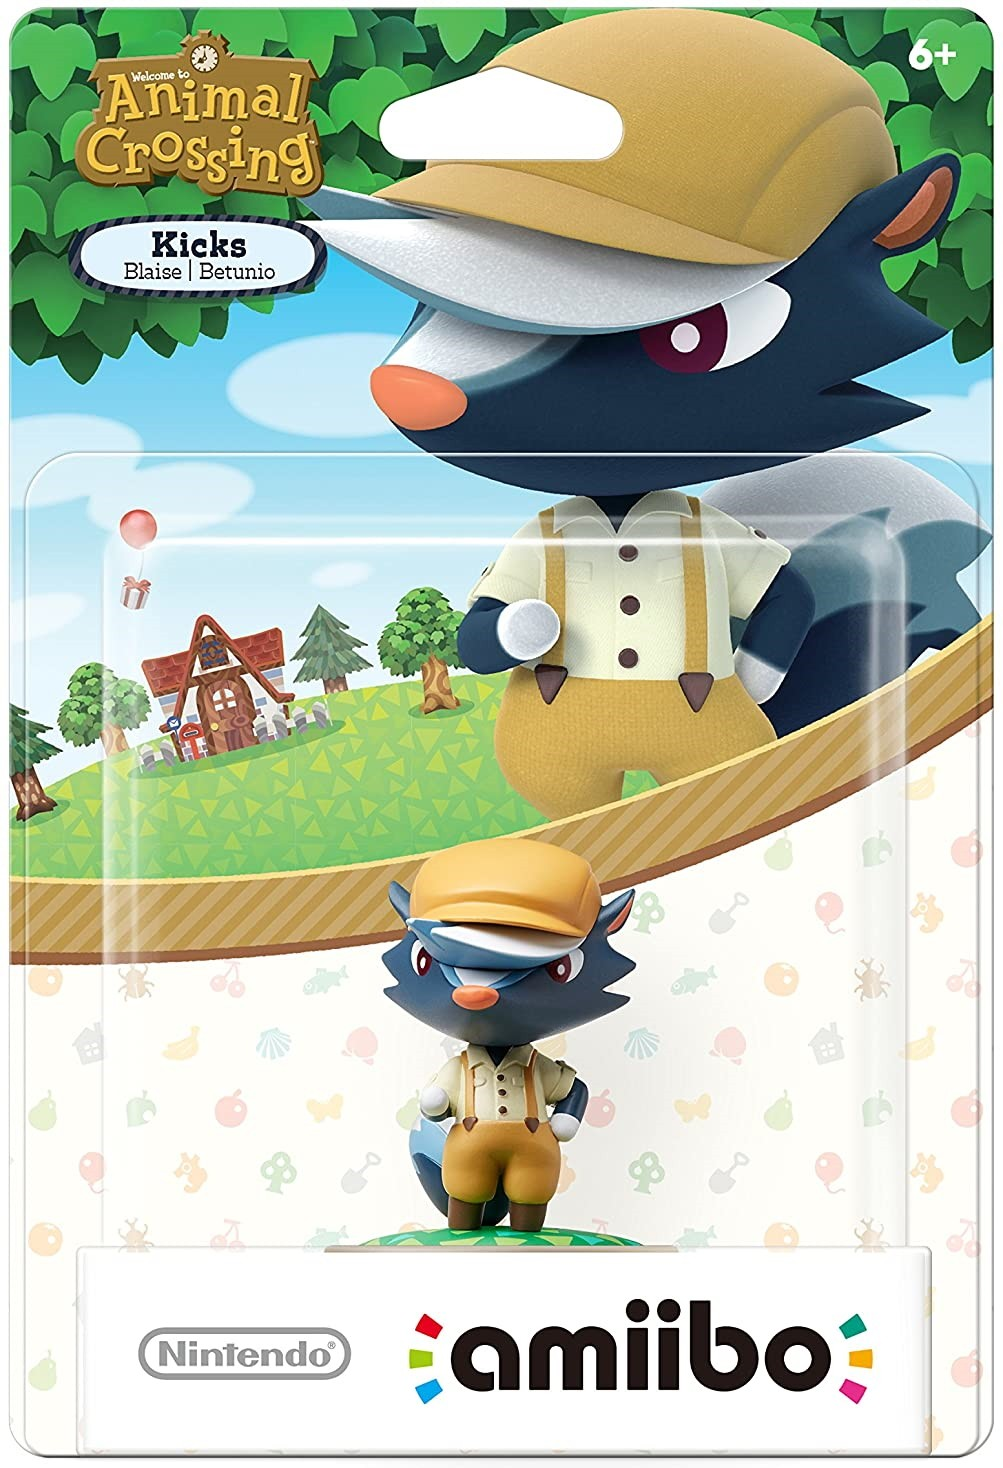 Animal Crossing Series Kicks amiibo. Интерактивная фигурка amiibo